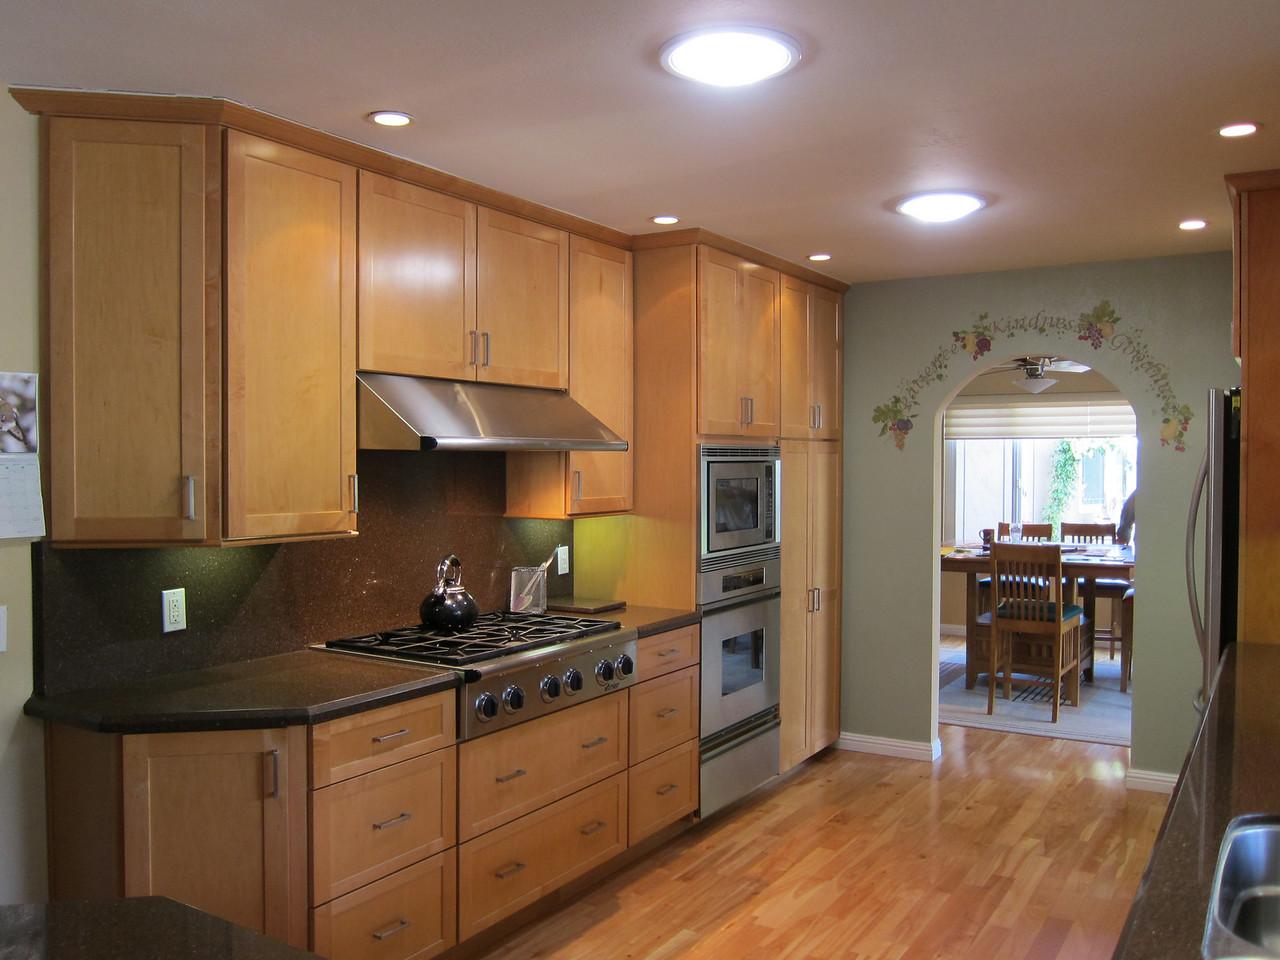 Six burner stove with large range hood...cooks love it.